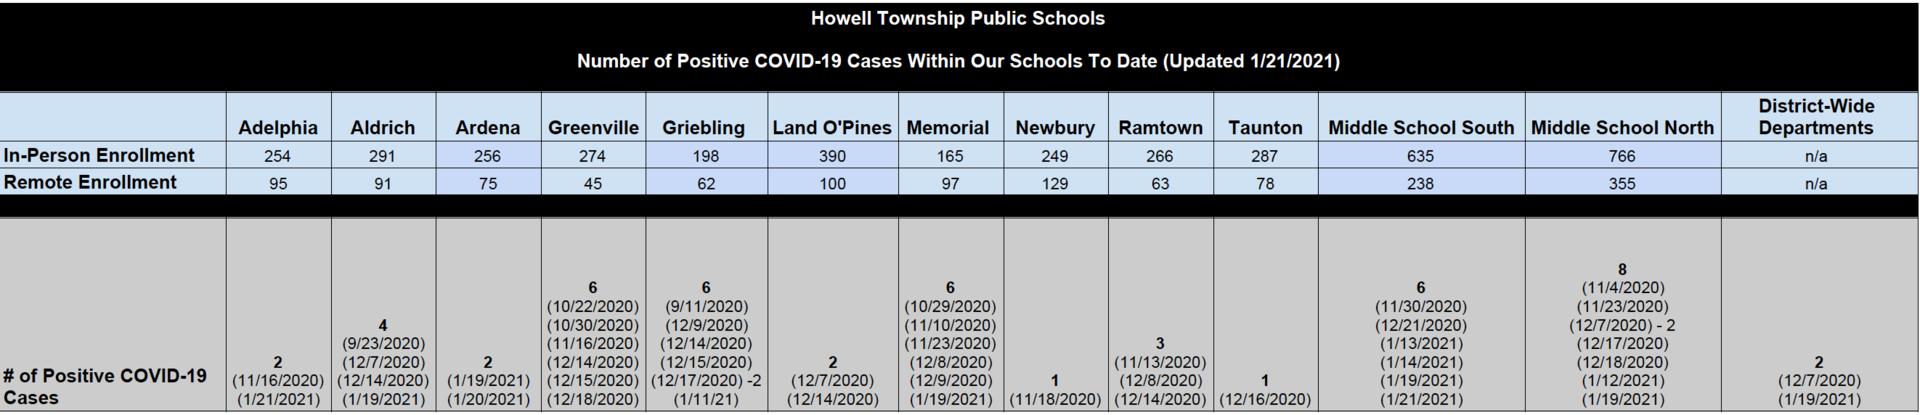 COVID-19 Status Report